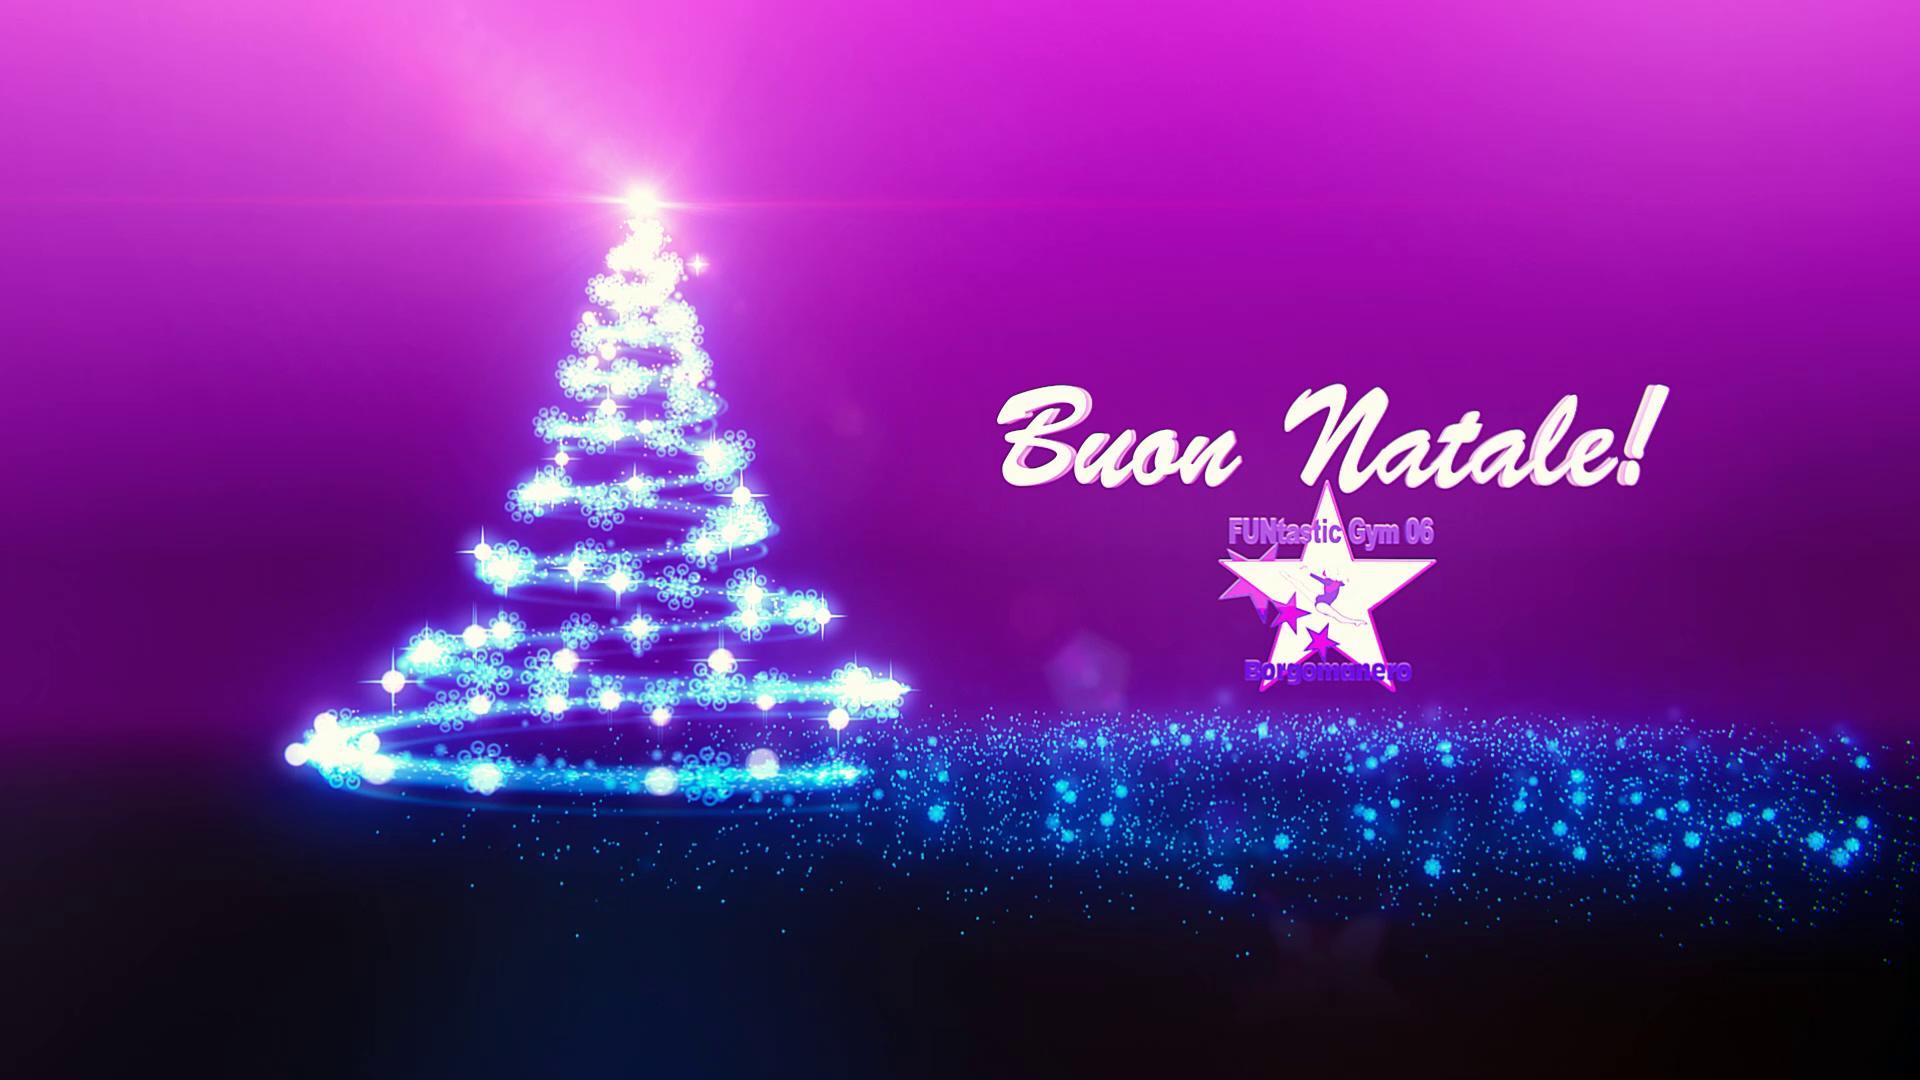 NataleFUN2014